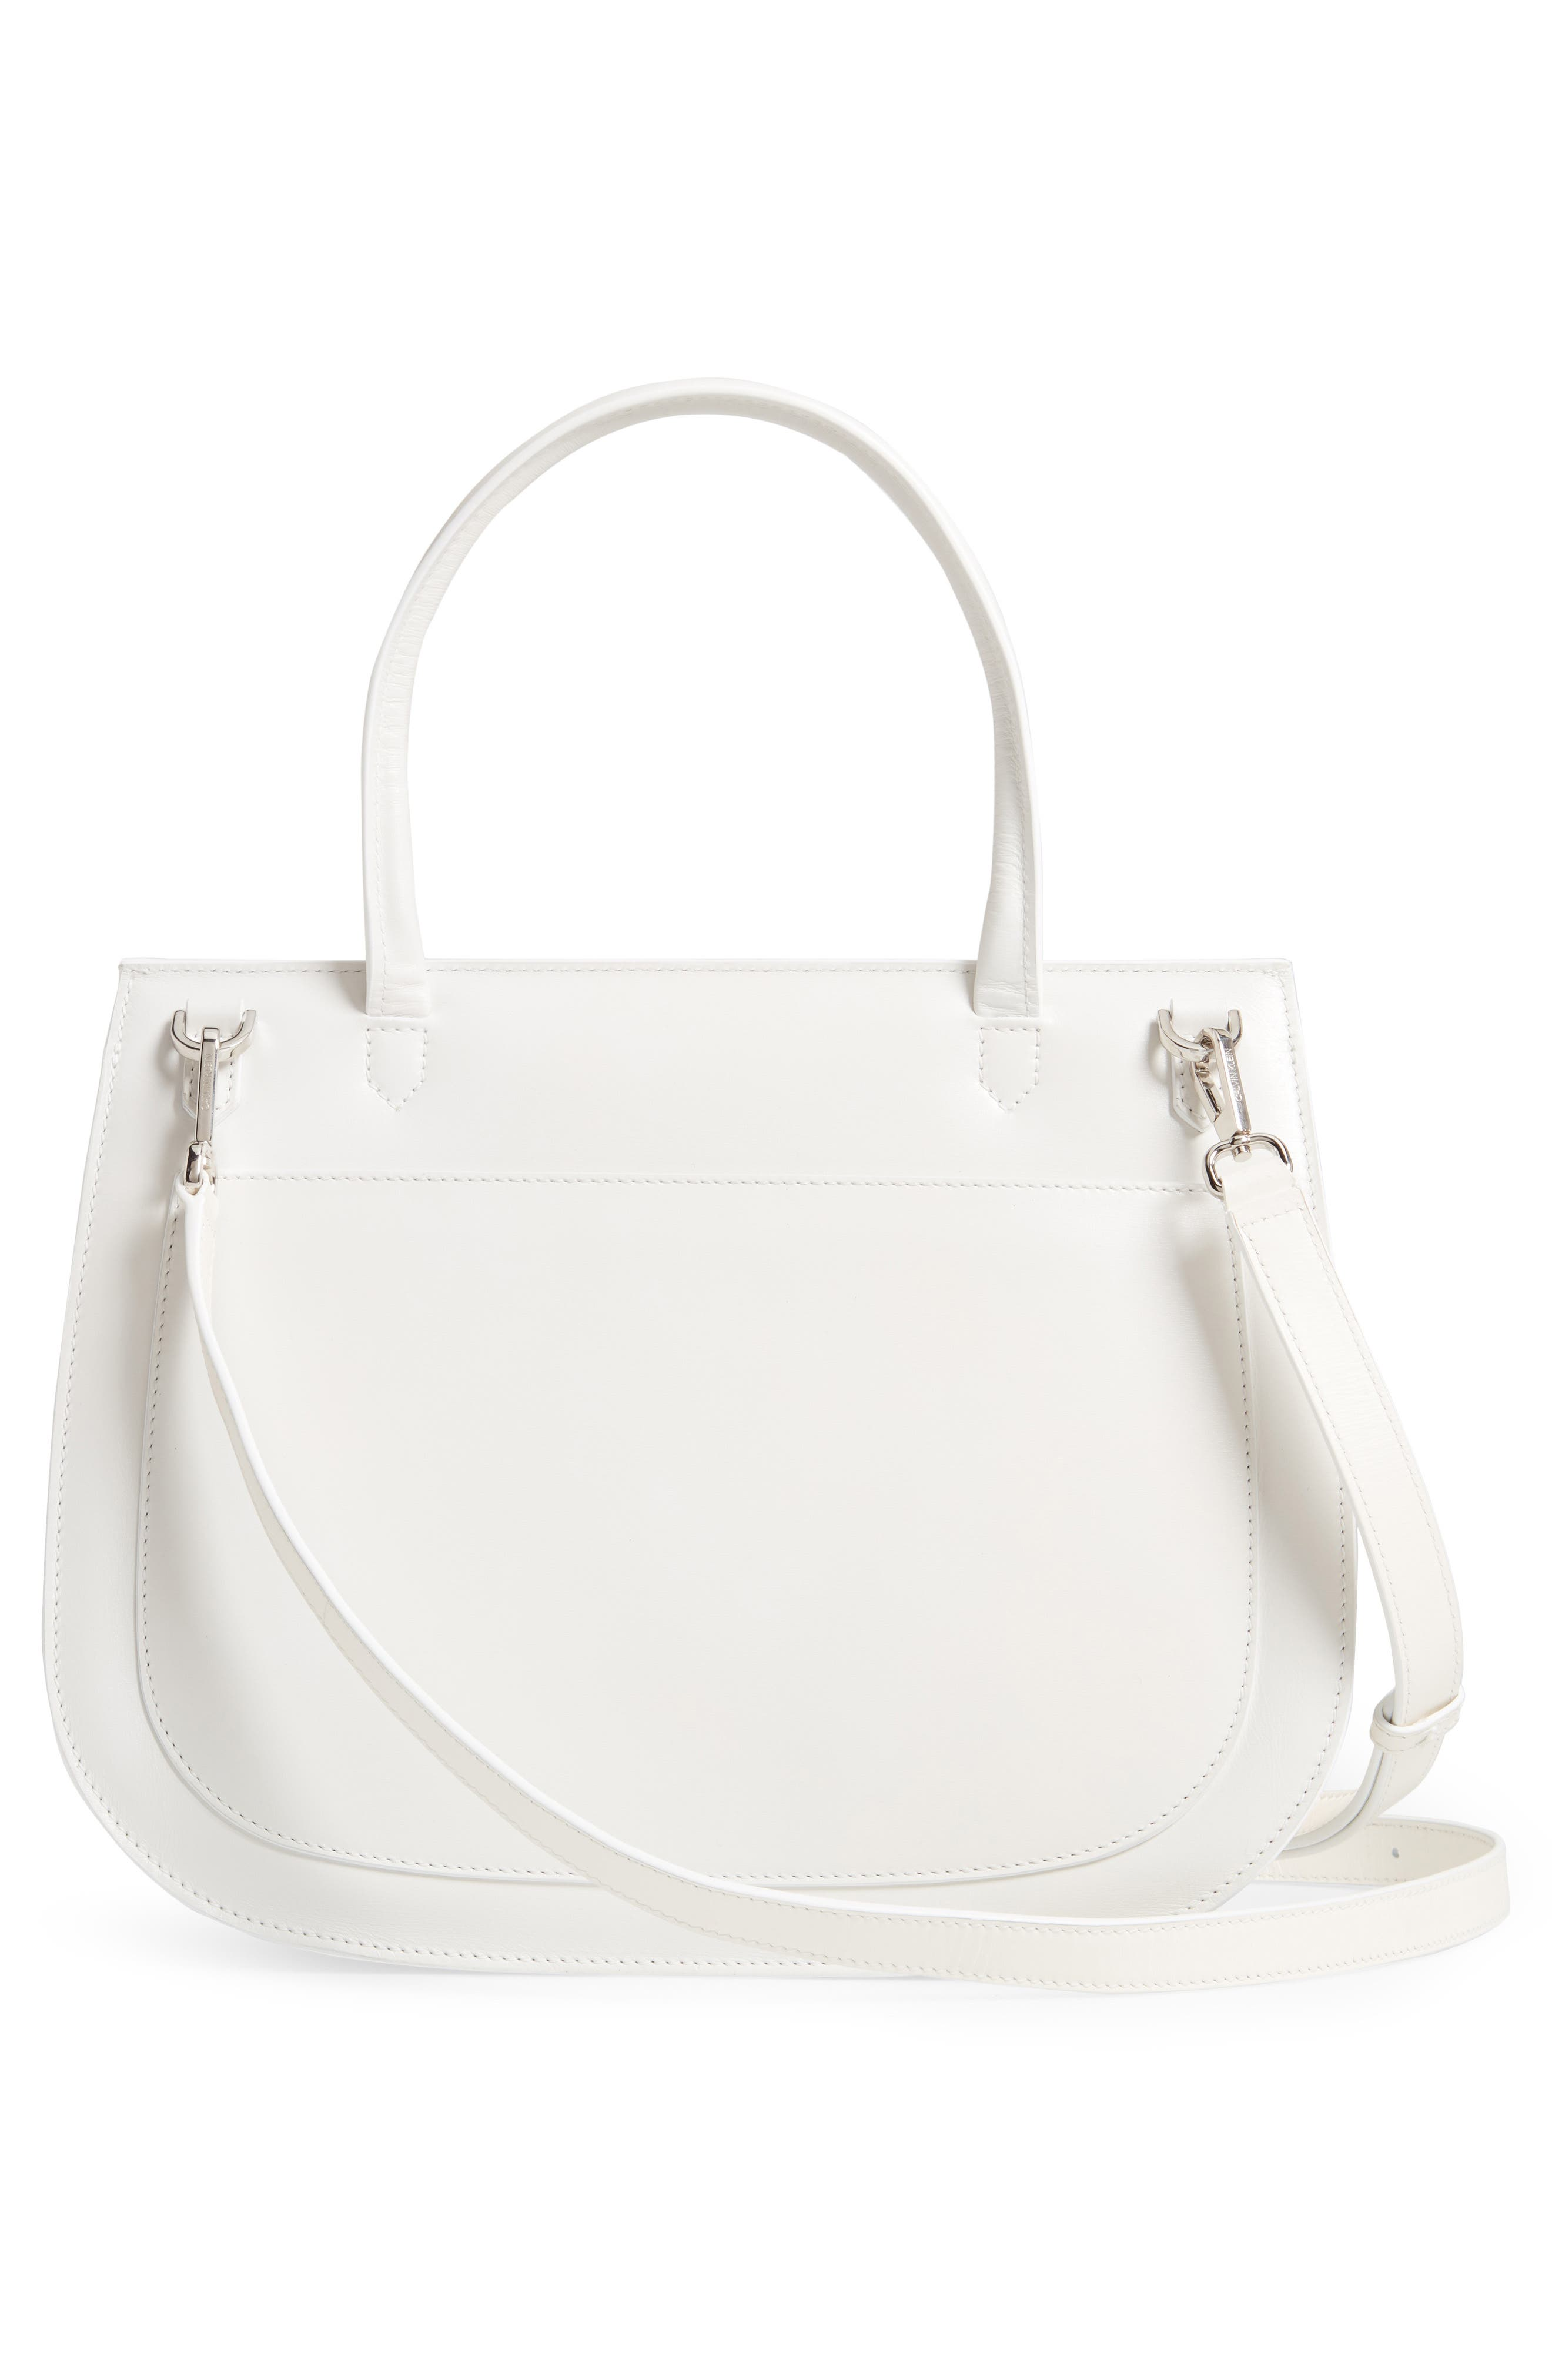 Top Handle Round Lock Shoulder Bag,                             Alternate thumbnail 3, color,                             101